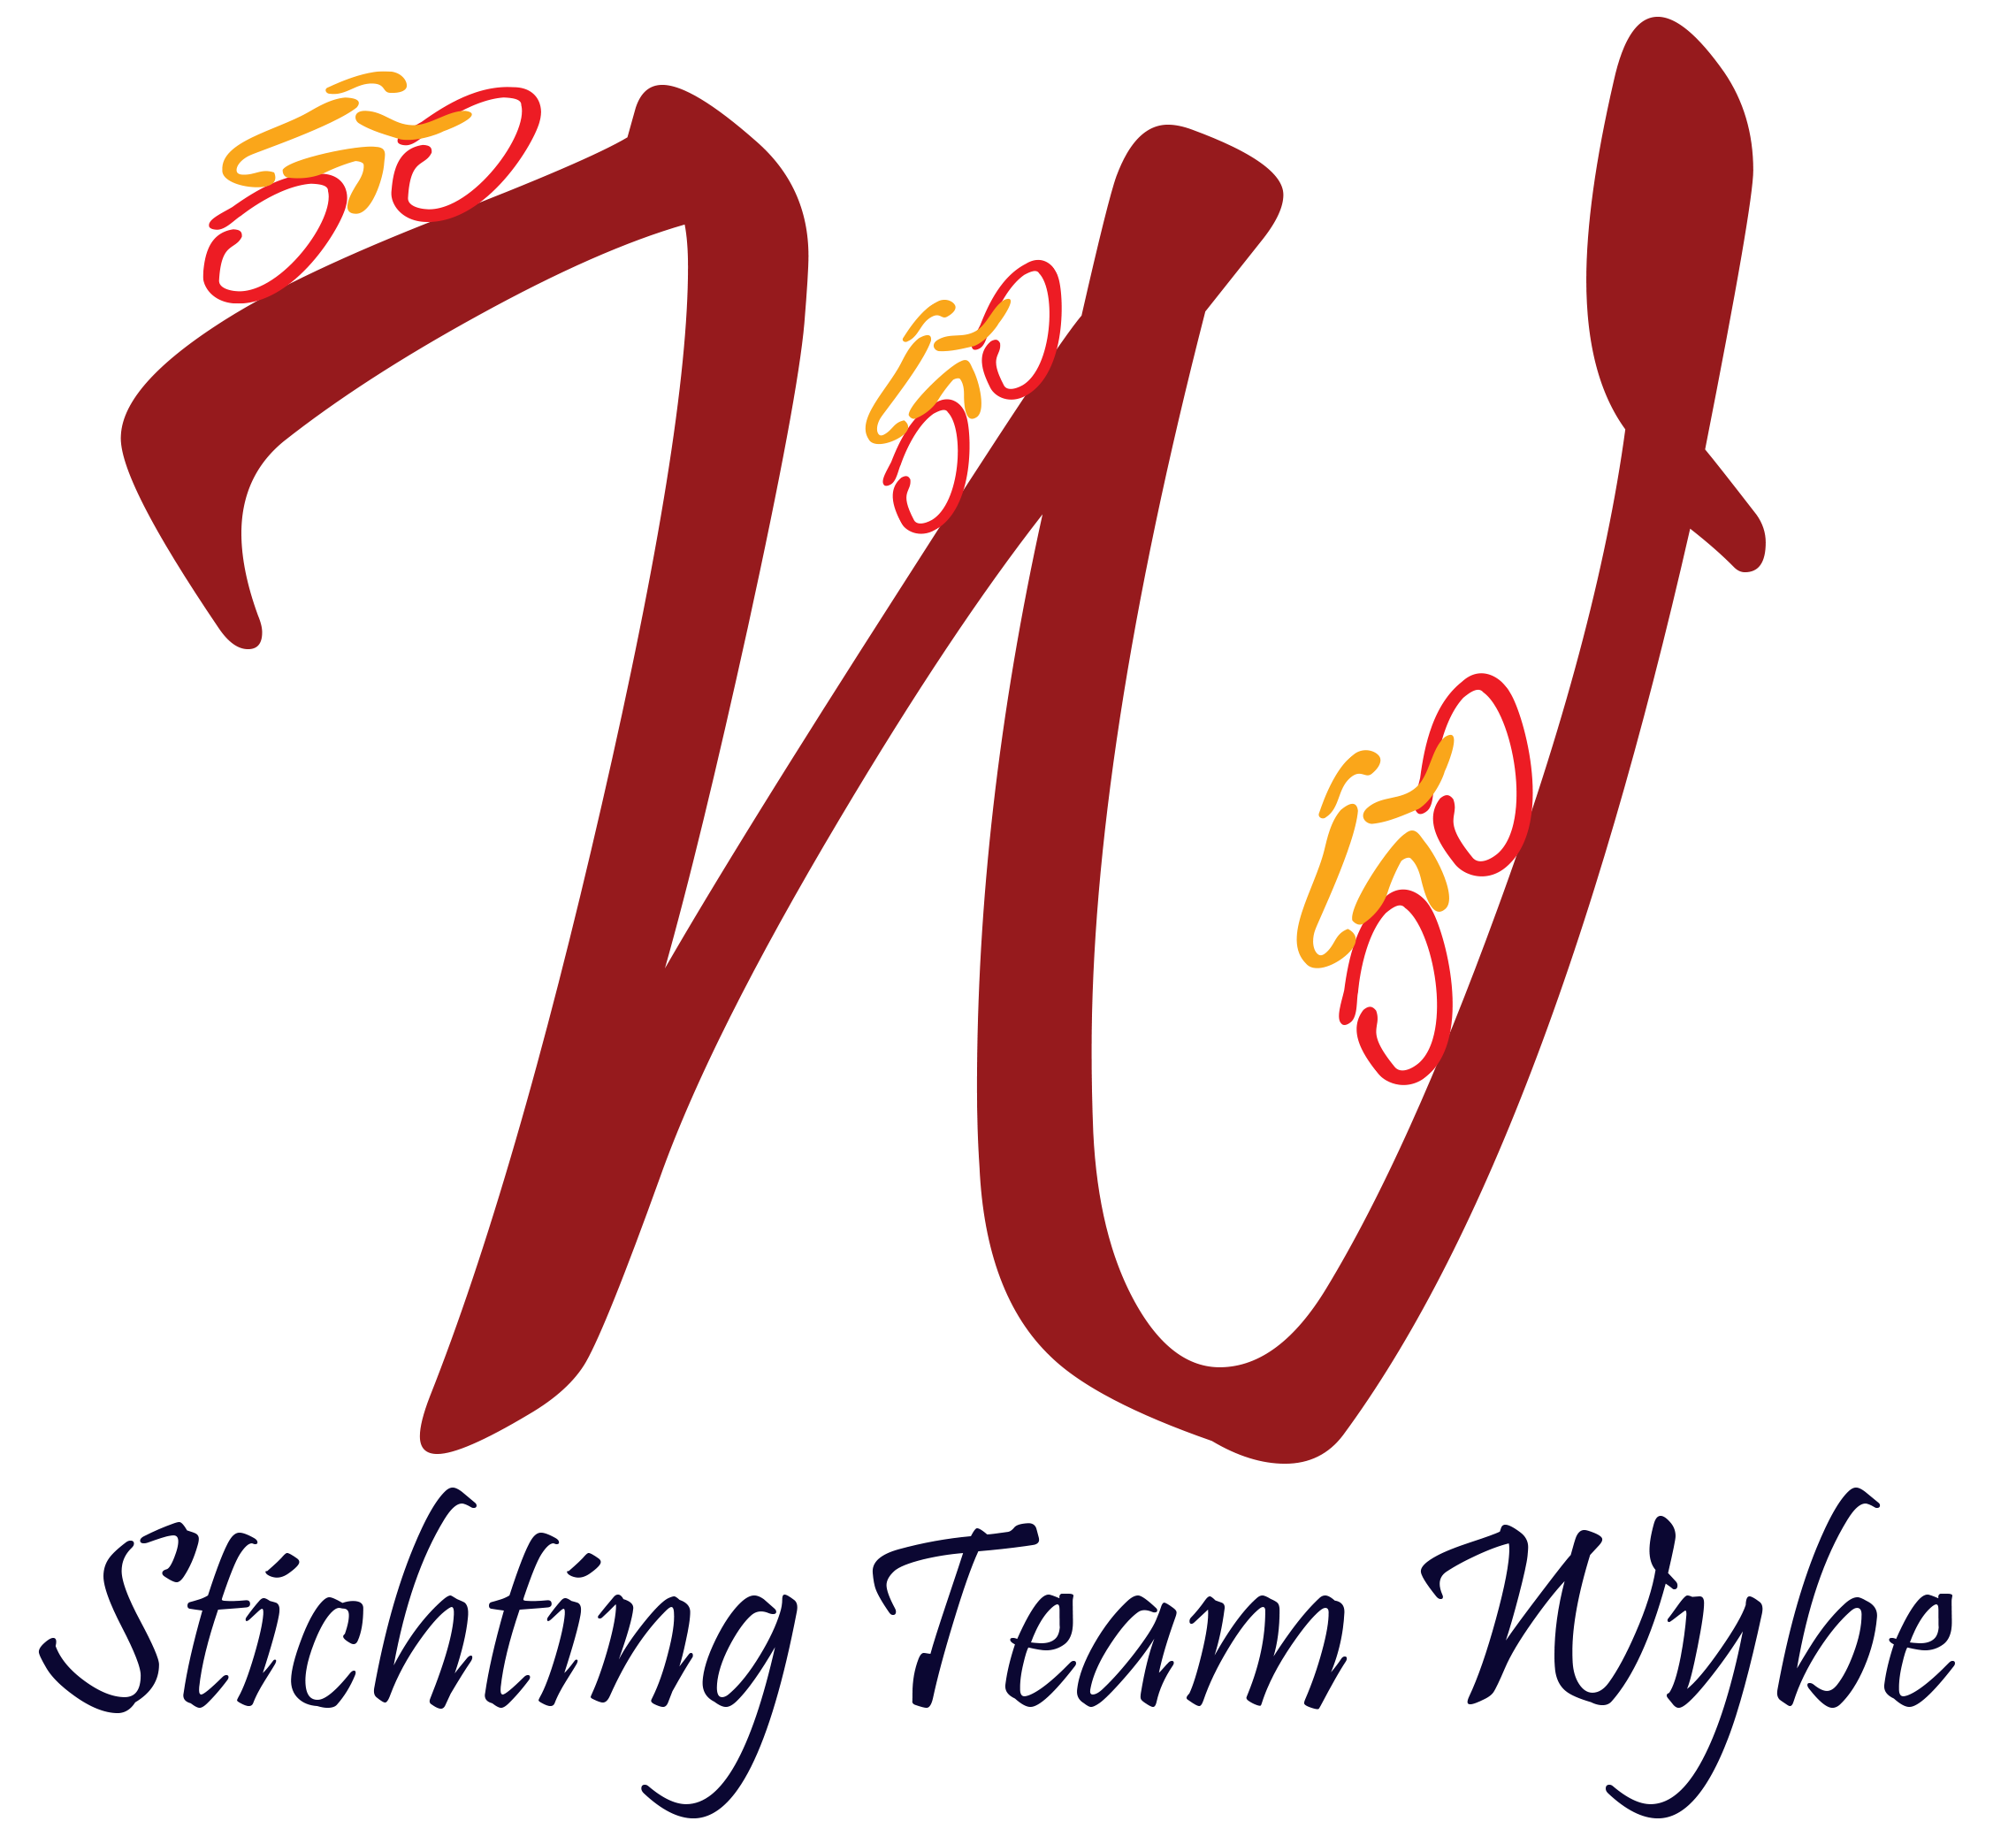 Team Wybe